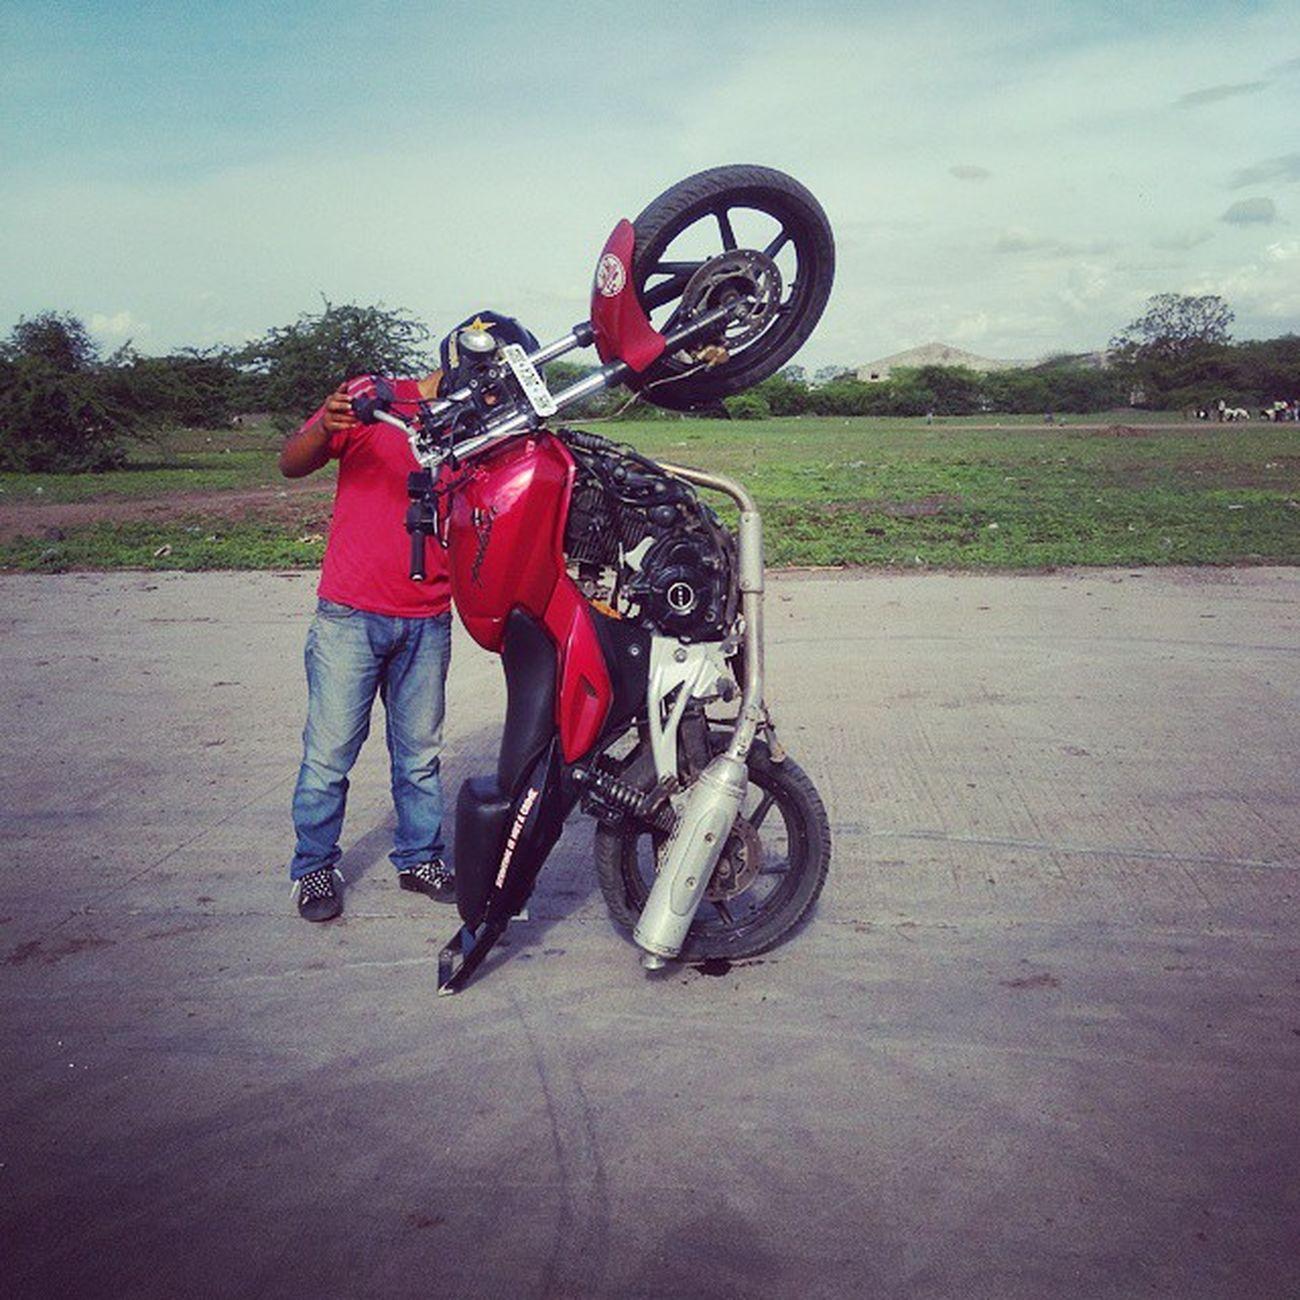 12oclock Wheelie Standing Stunts stuntersofinstagram stuntlife stuntingdna life likesforlikes followforfollow tagfortag